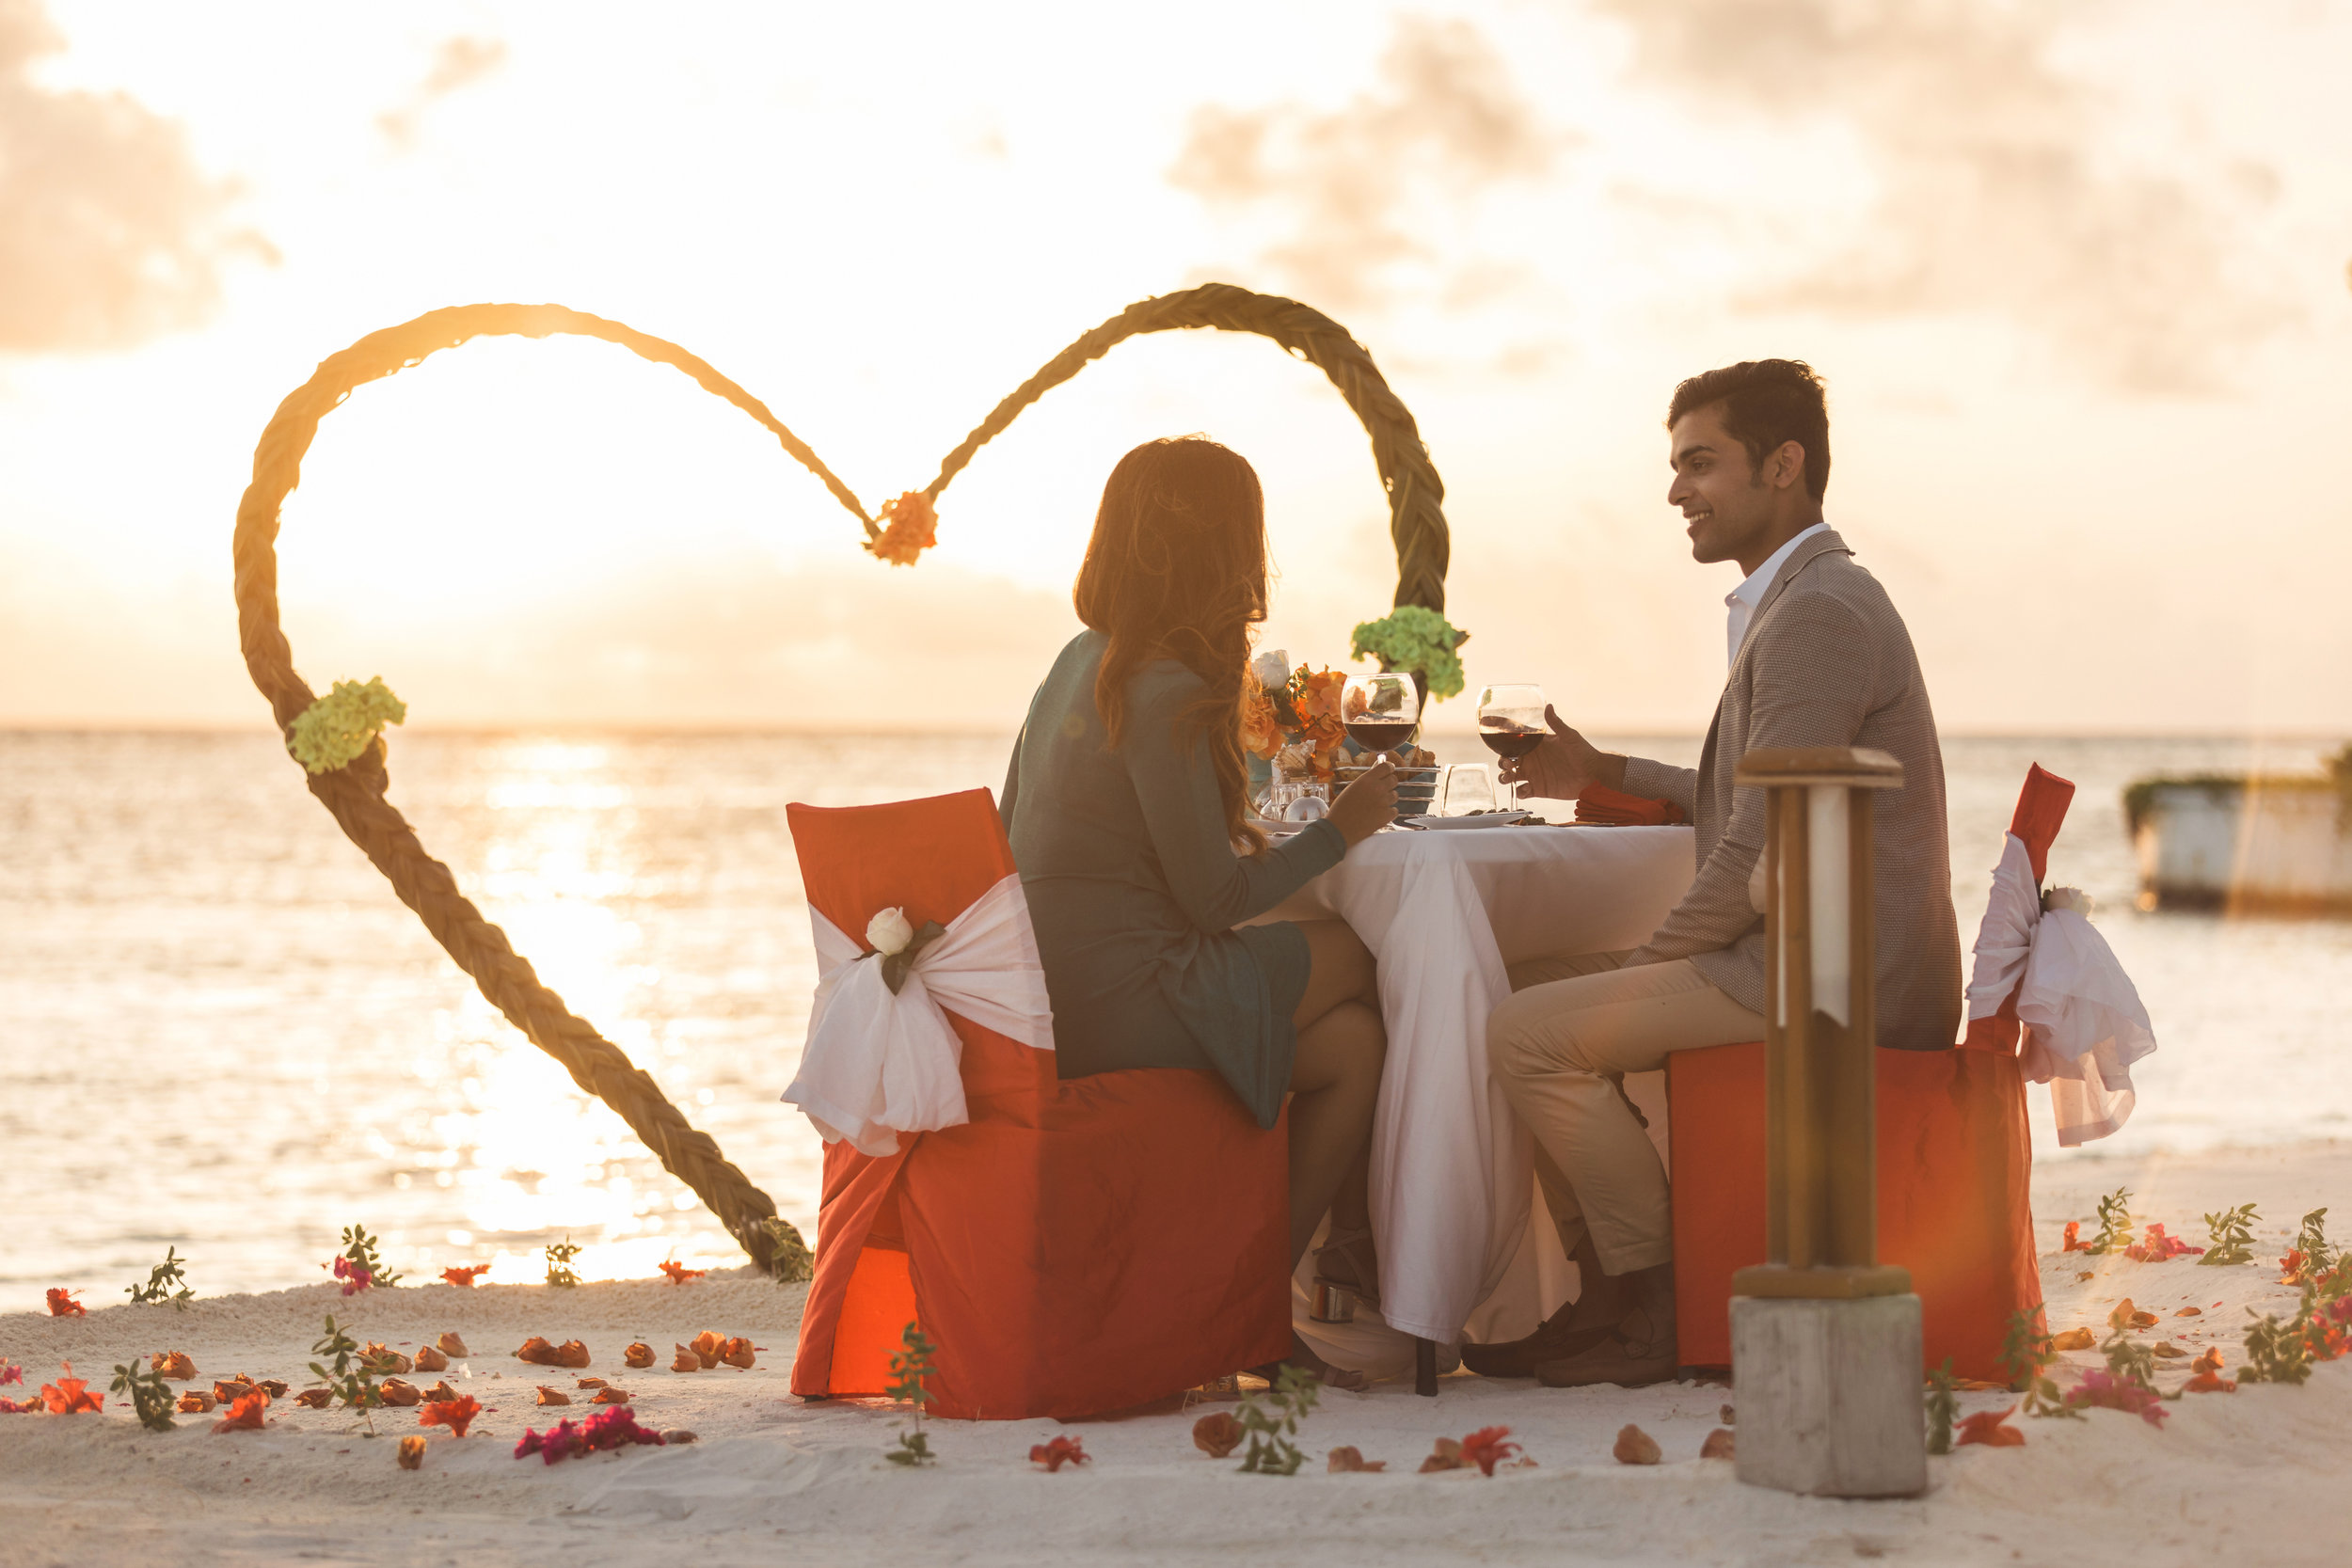 Kanv - Romantic Dinner_1.jpg